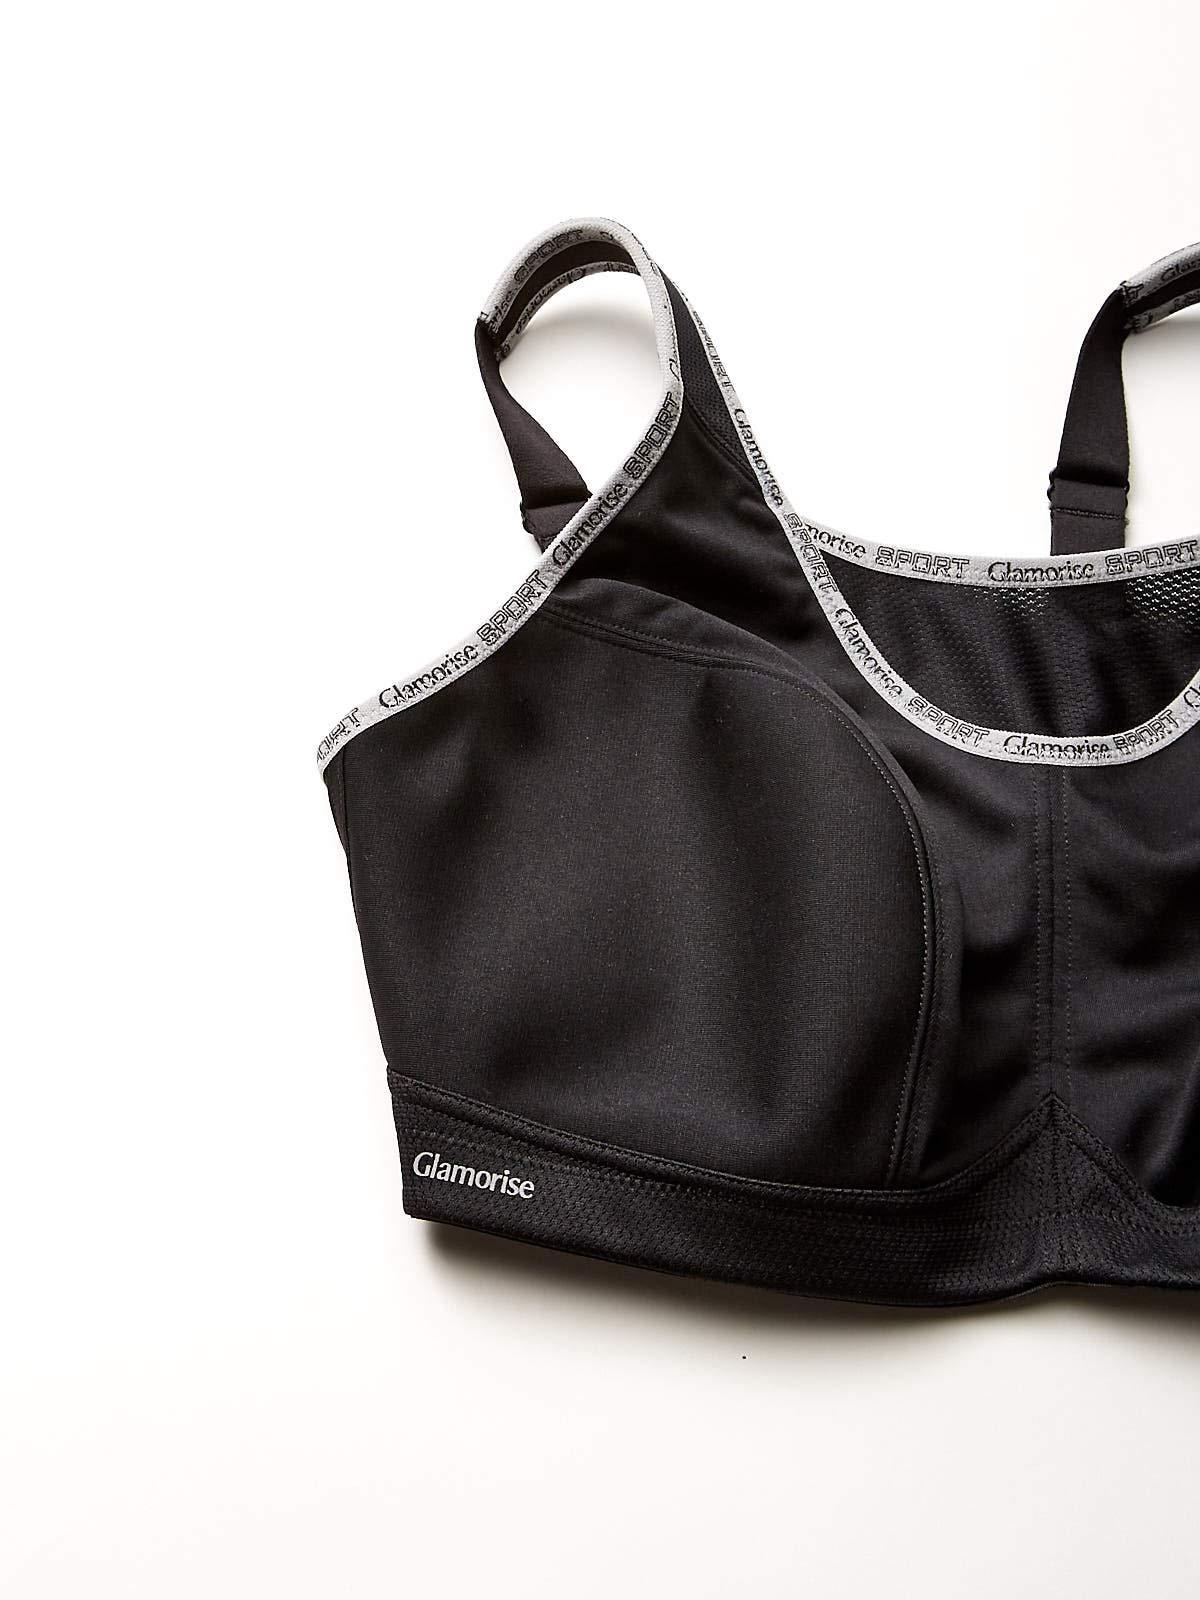 Glamorise Women's Plus-size Full Figure No-Bounce Camisole Wirefree Sports Bra #1066 Bra , BLACK PRINT 34J by Glamorise